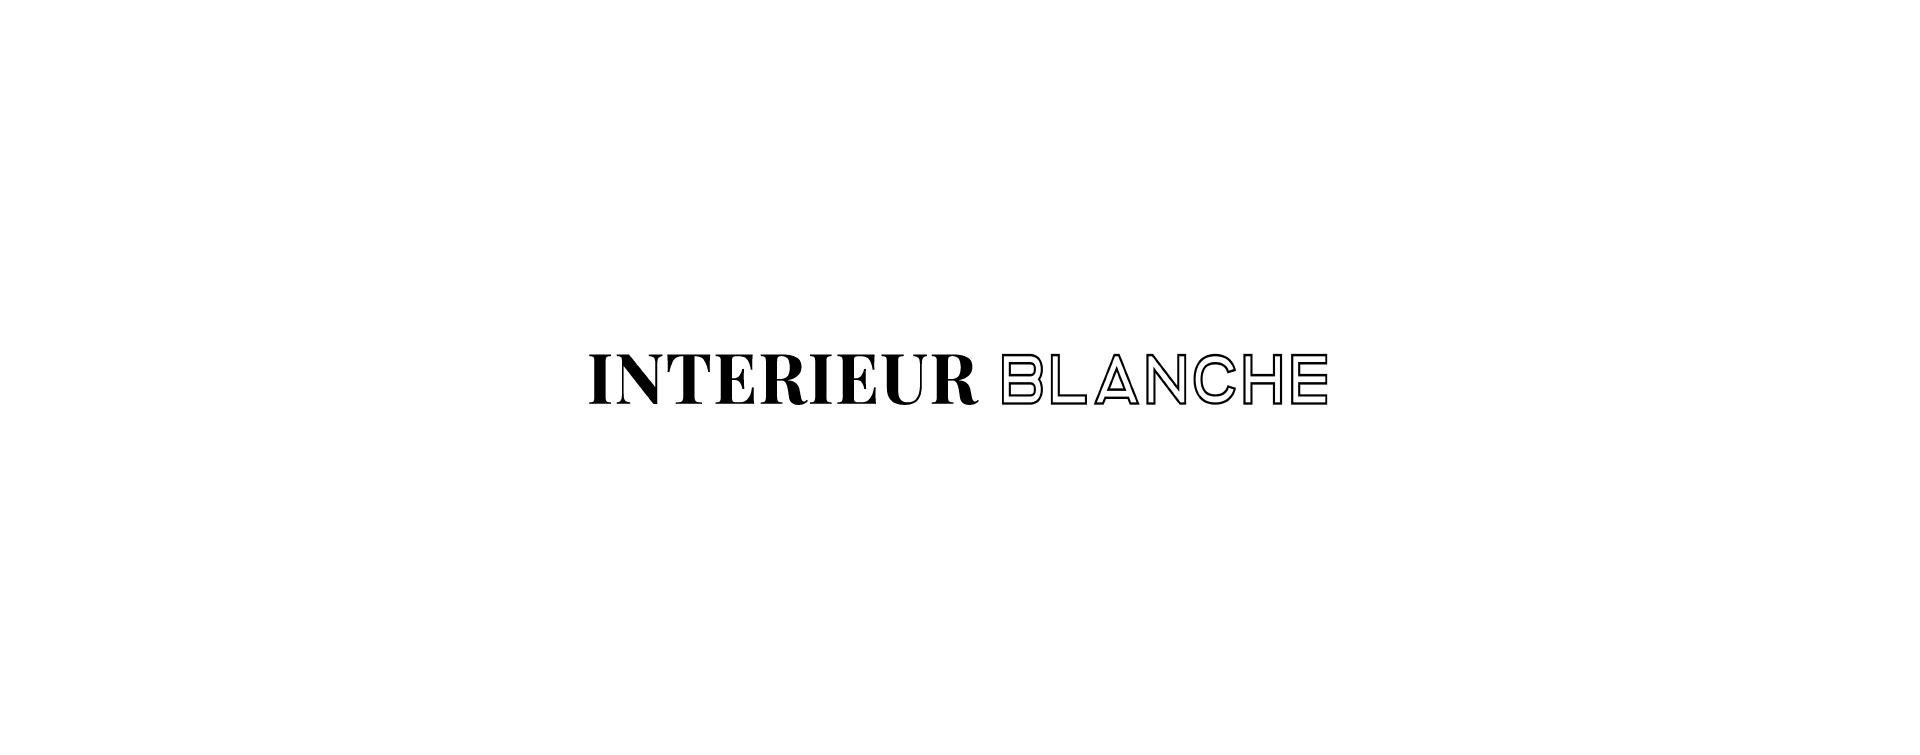 logo minimaliste noir et blanc